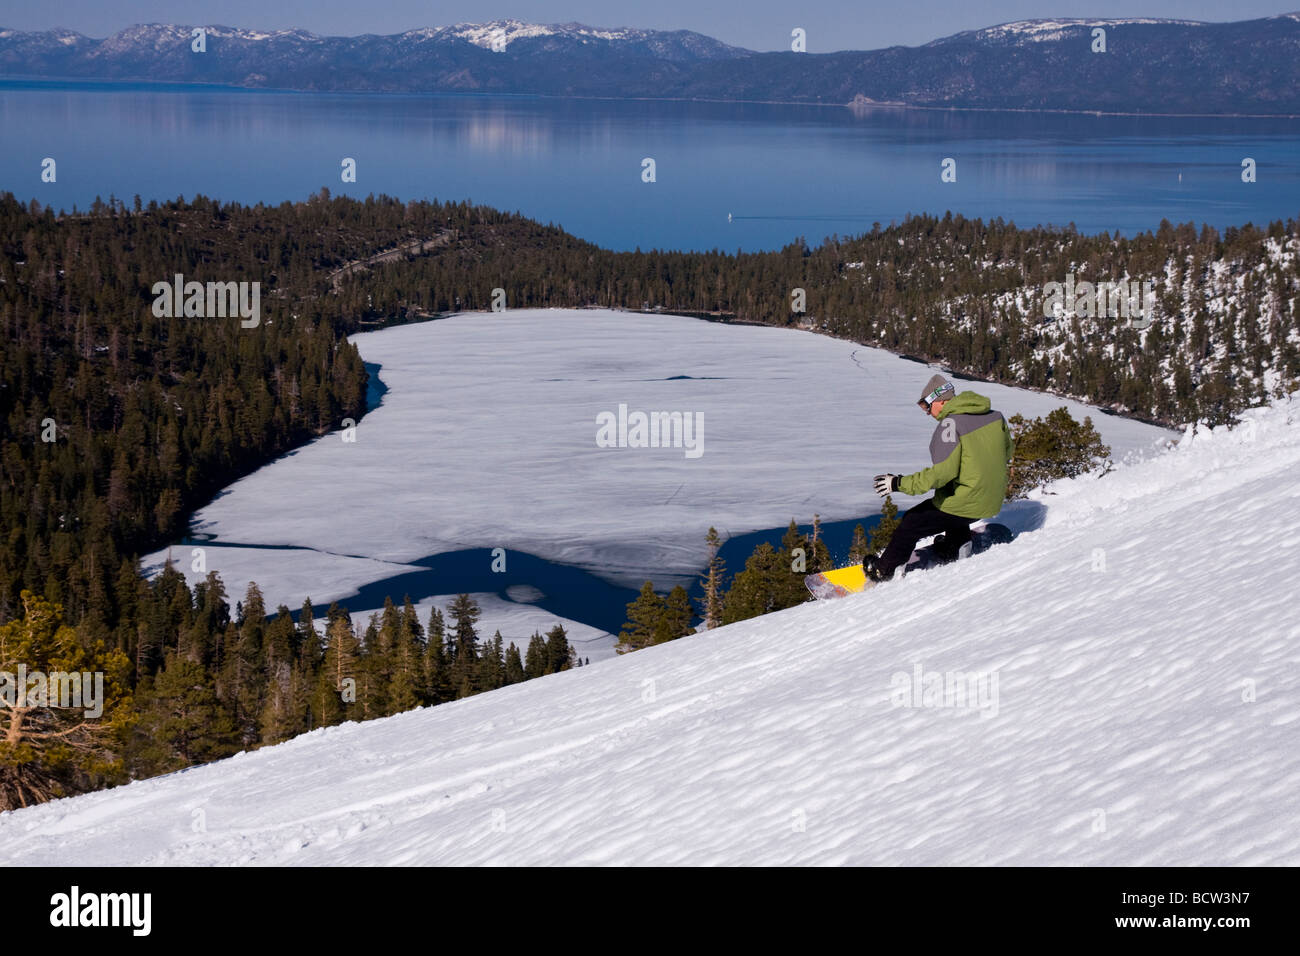 Man snowboarding, Lake Tahoe, California, USA Stock Photo